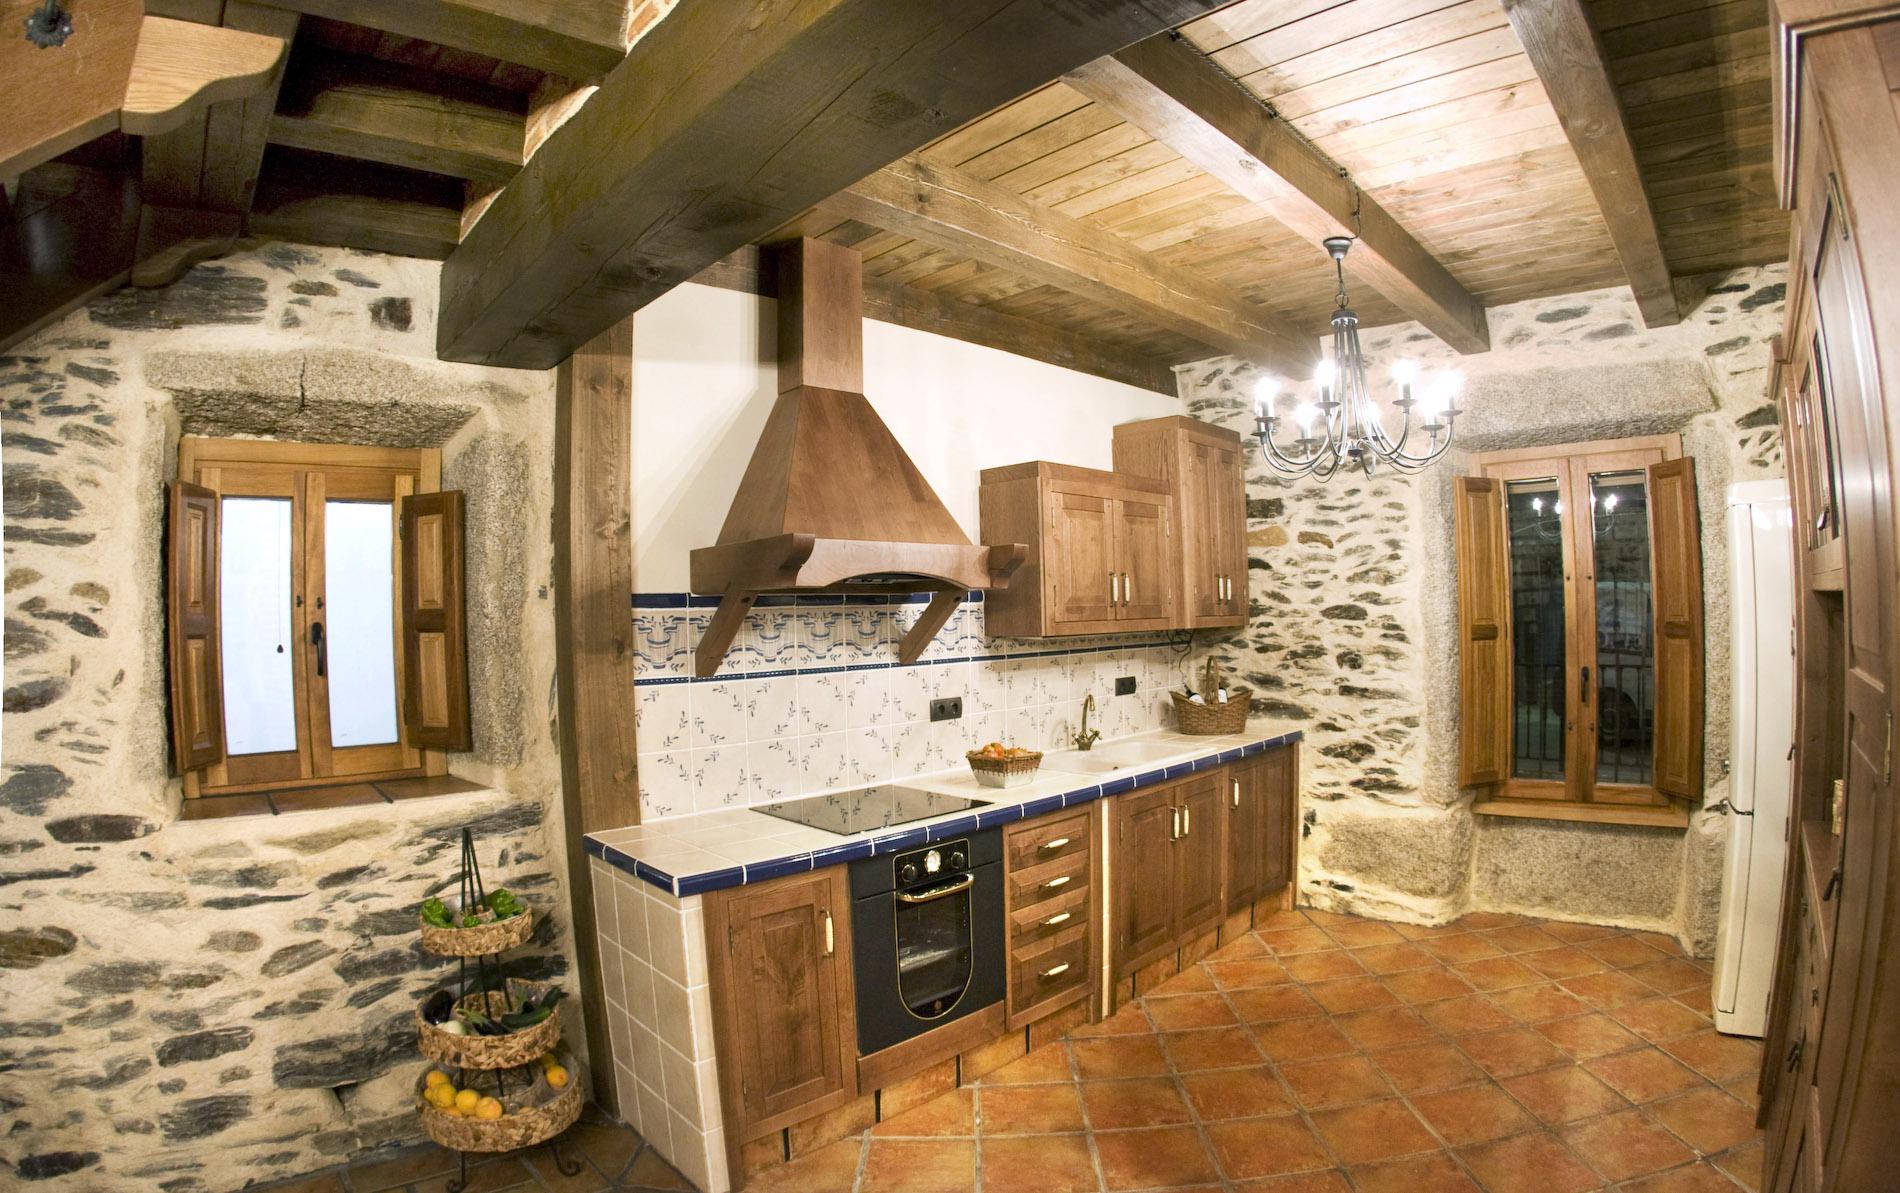 Sal n cocina siega verde casa rural - Ideas para casas rurales ...